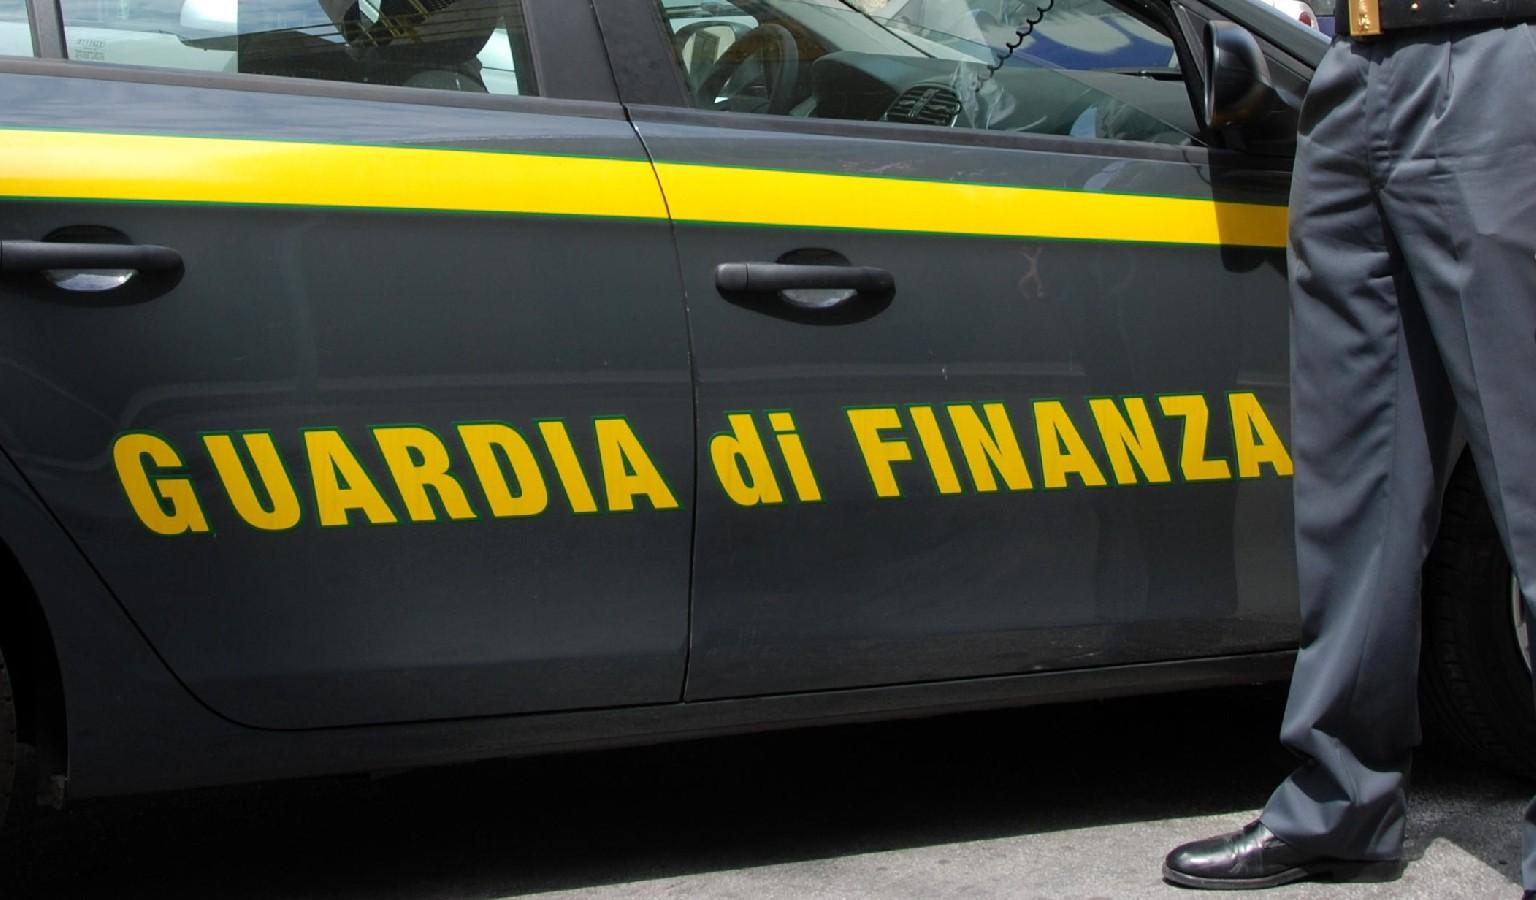 Arrestati due imprenditori per furto di energia elettrica